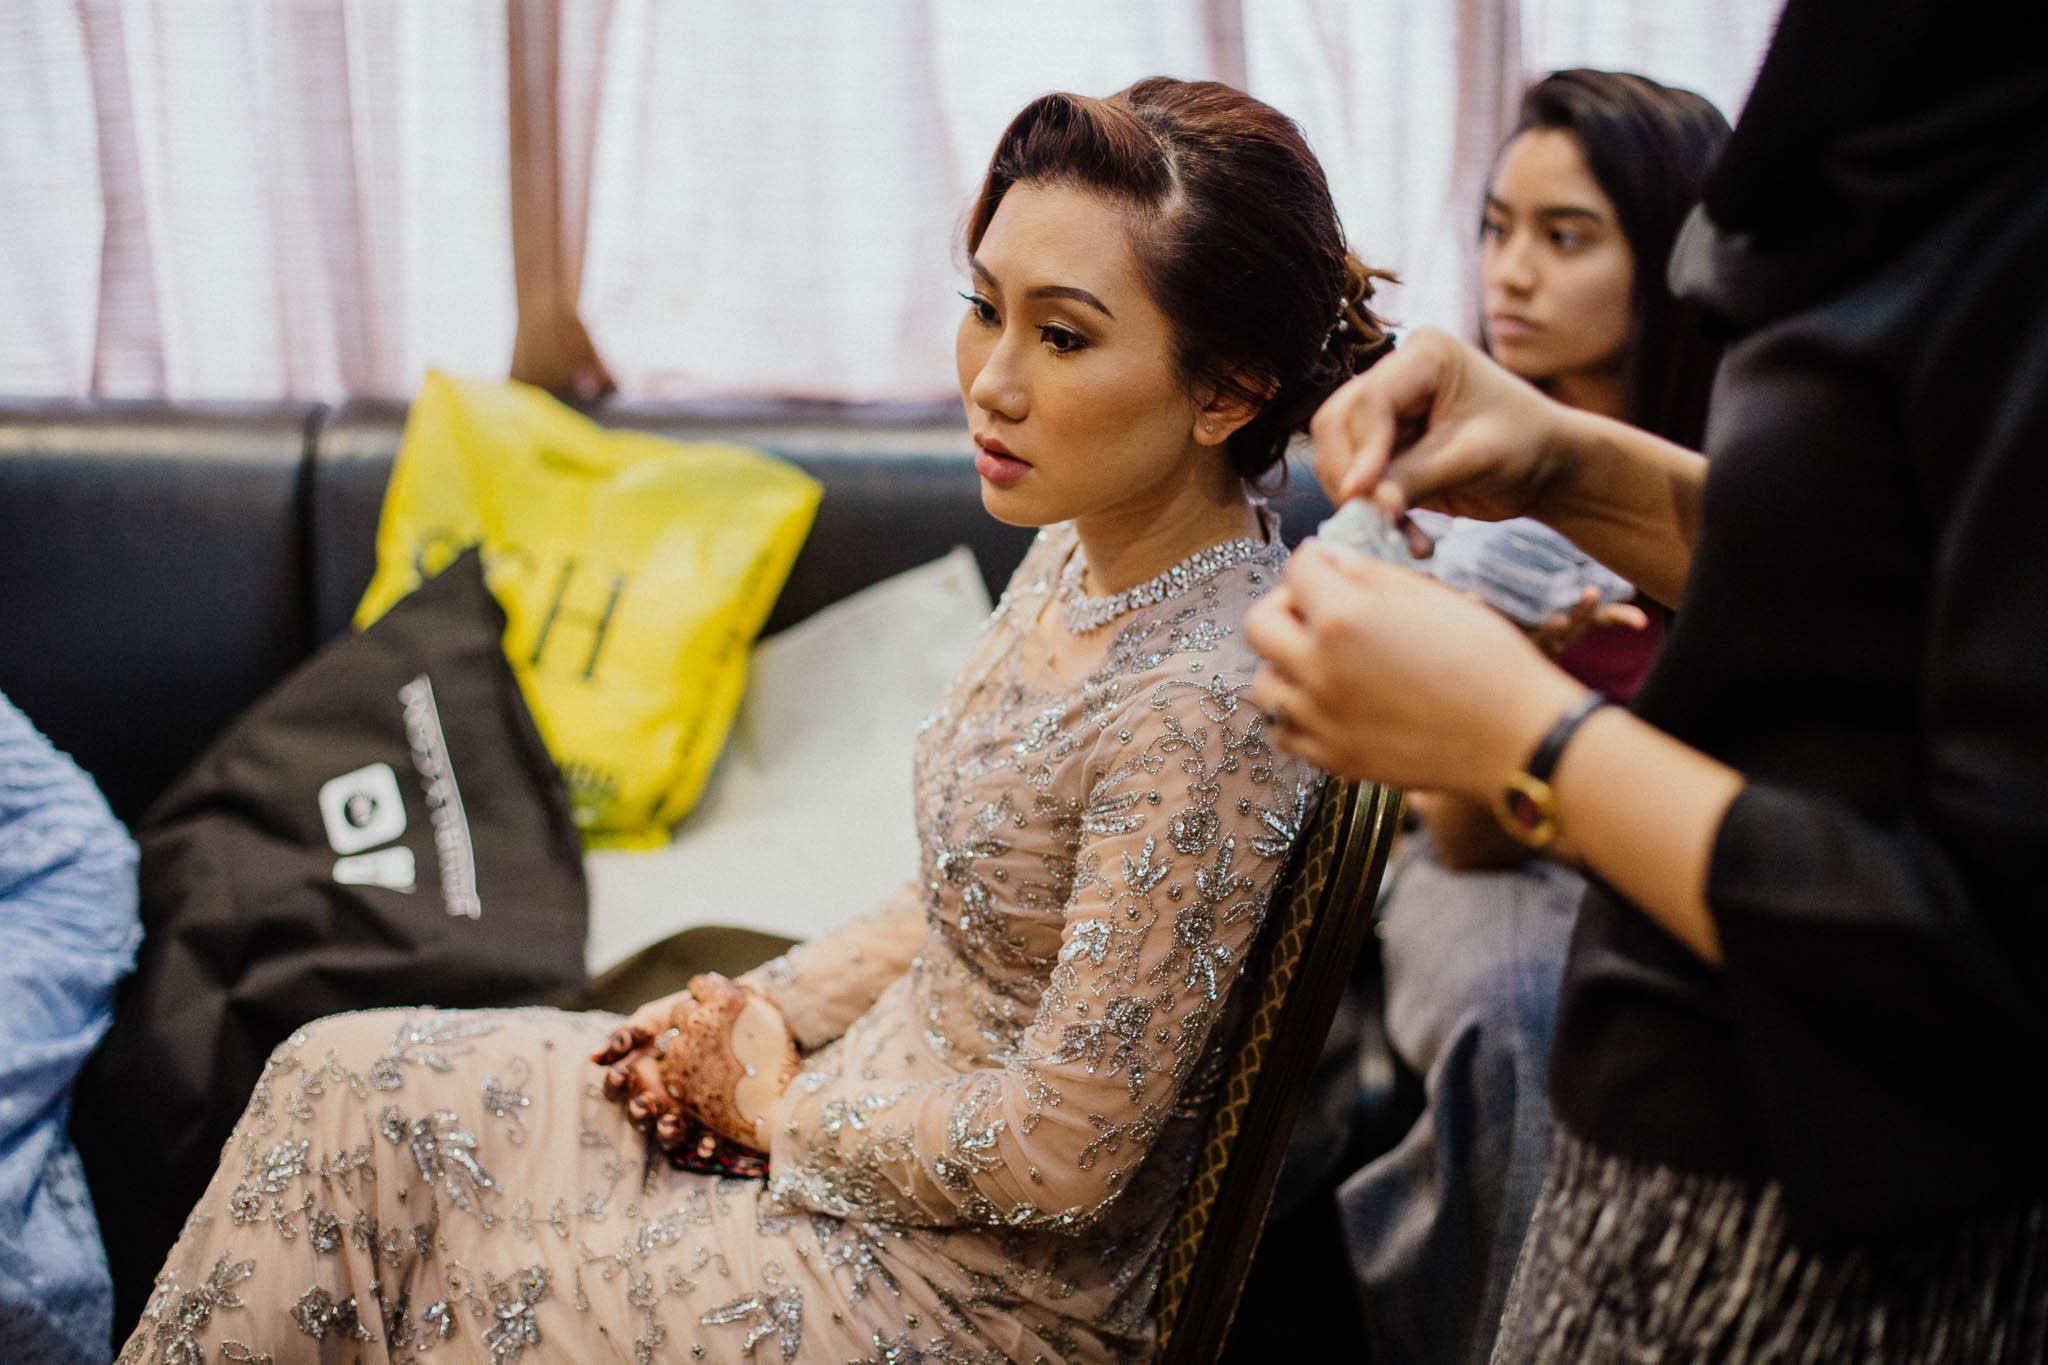 singapore-wedding-photographer-addafiq-nufail-039.jpg